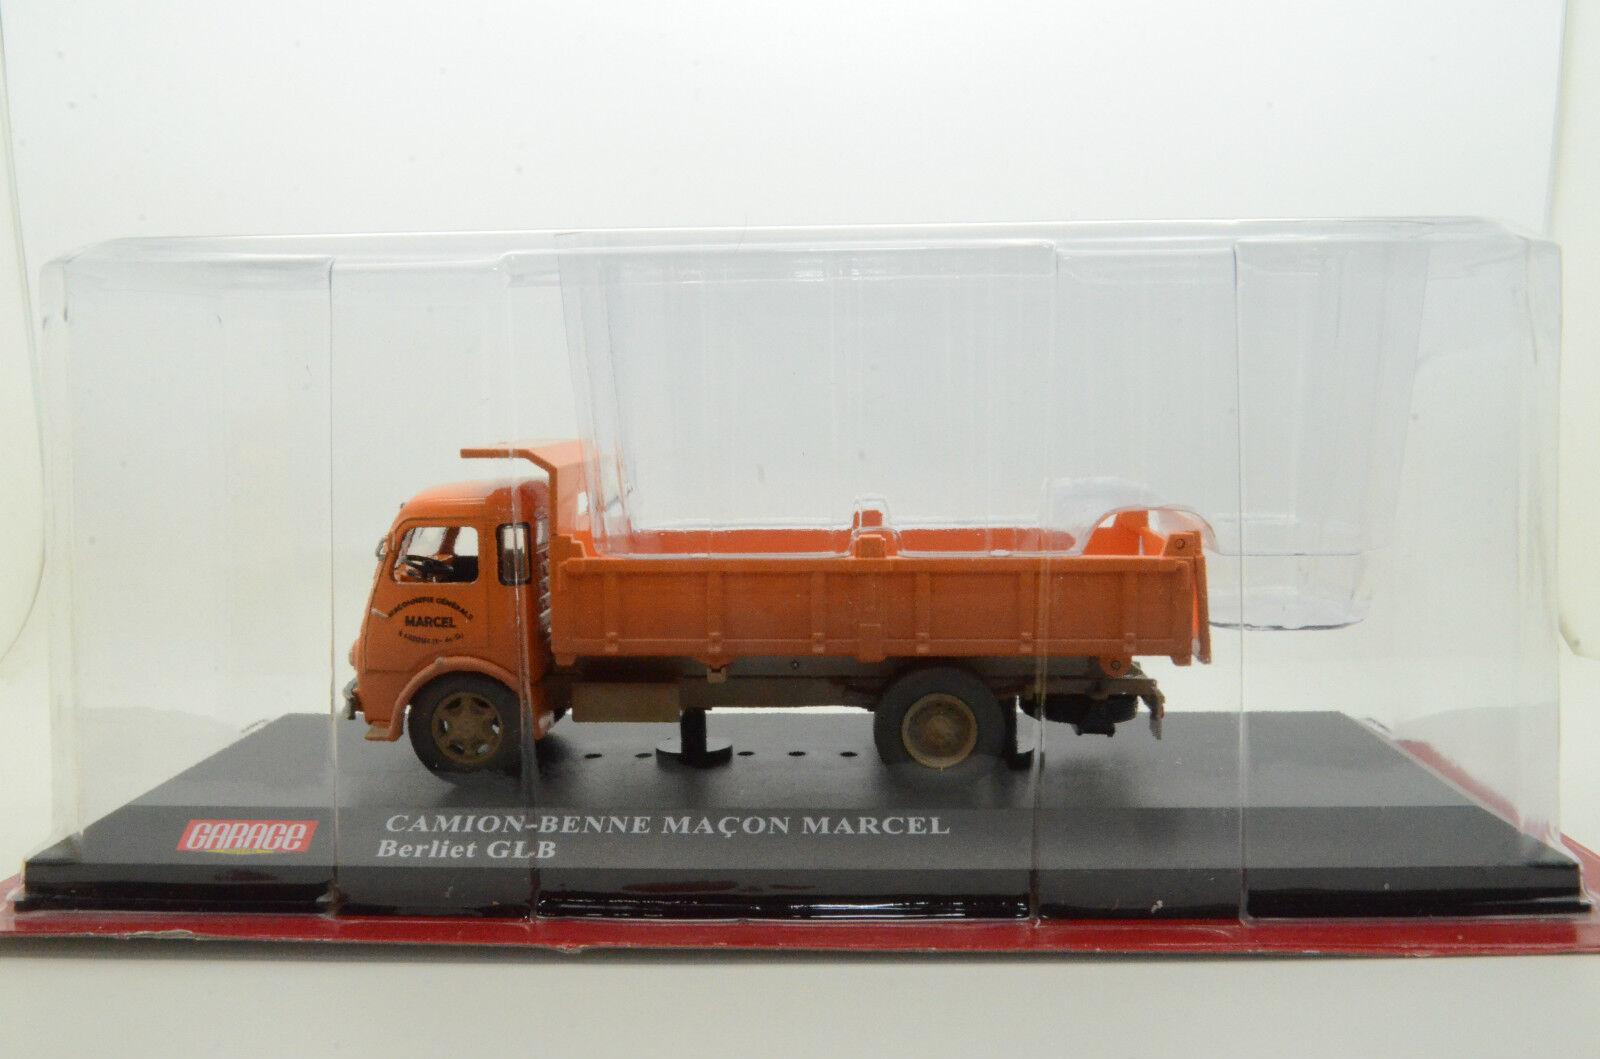 rara BERLIET GLB Camion Ajonjoli Macon Marcel camión 1/43 ALTAYA/IXO